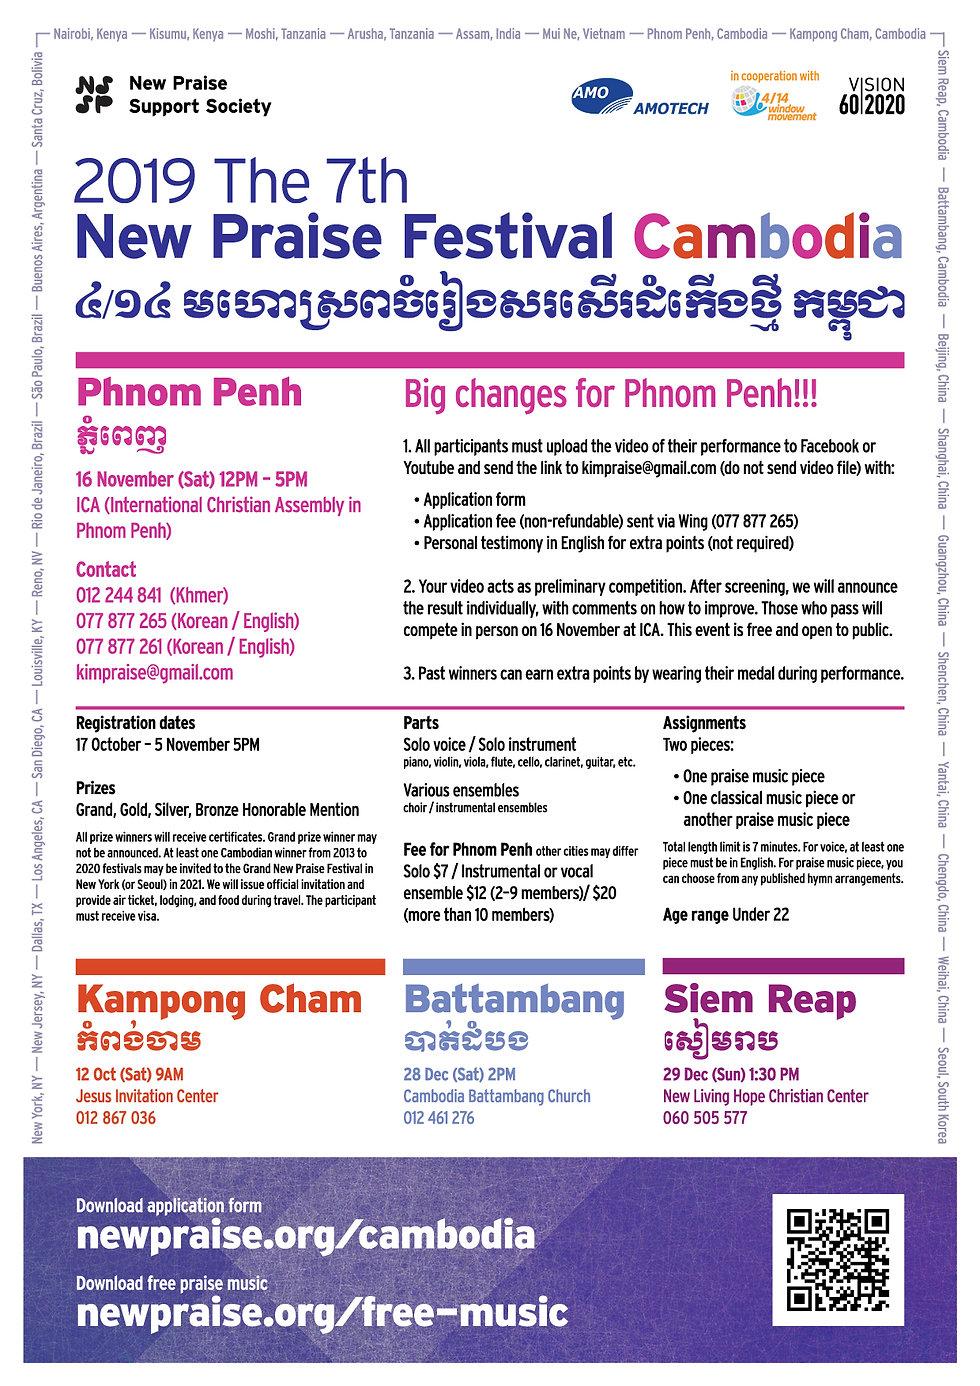 cambodia_pp_brochure.jpg